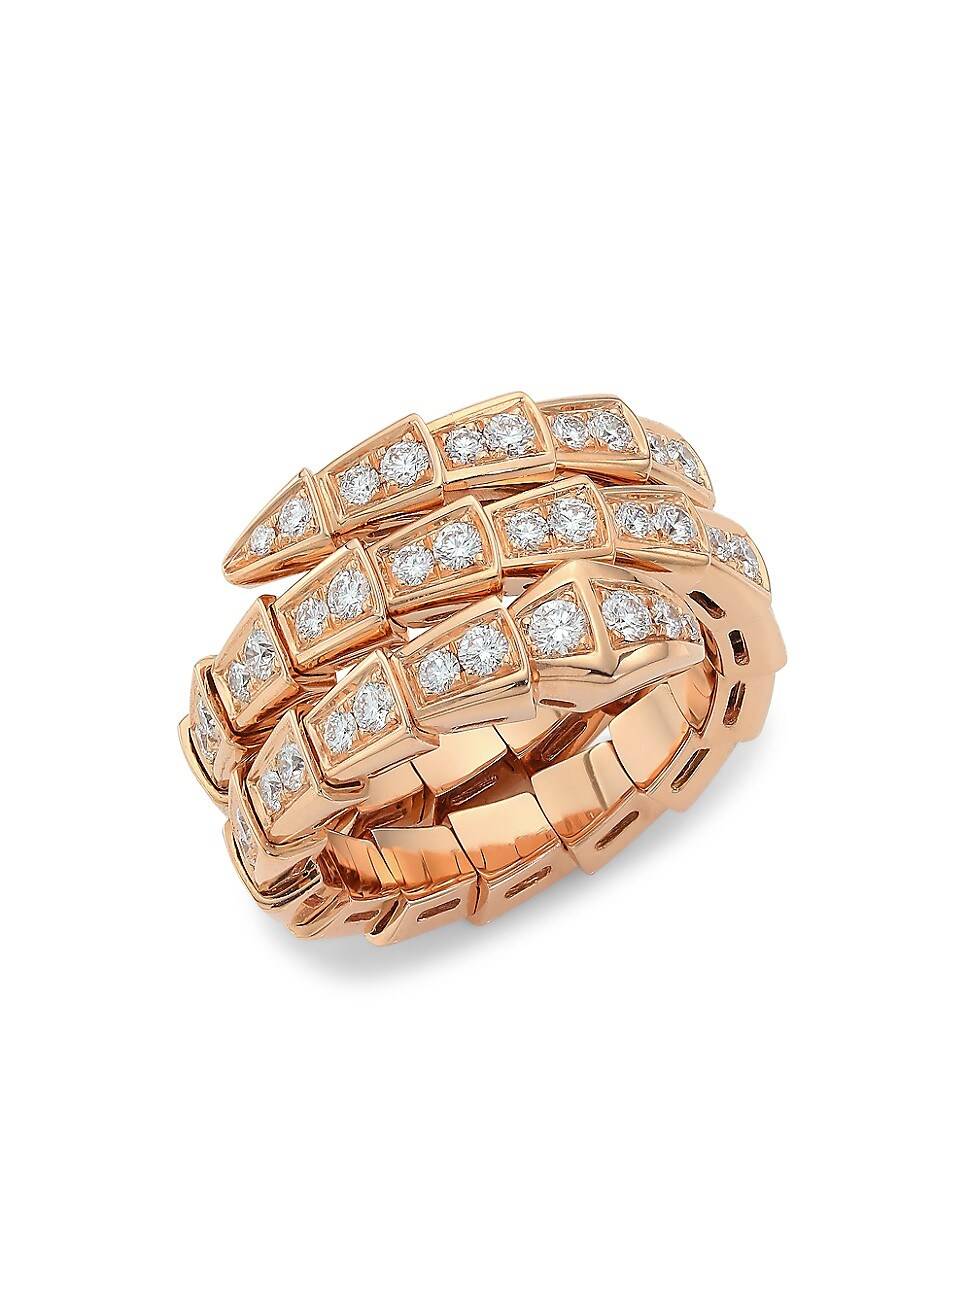 Bvlgari Rings WOMEN'S SERPENTI VIPER 18K ROSE GOLD & PAVÉ DIAMOND 2-COIL RING